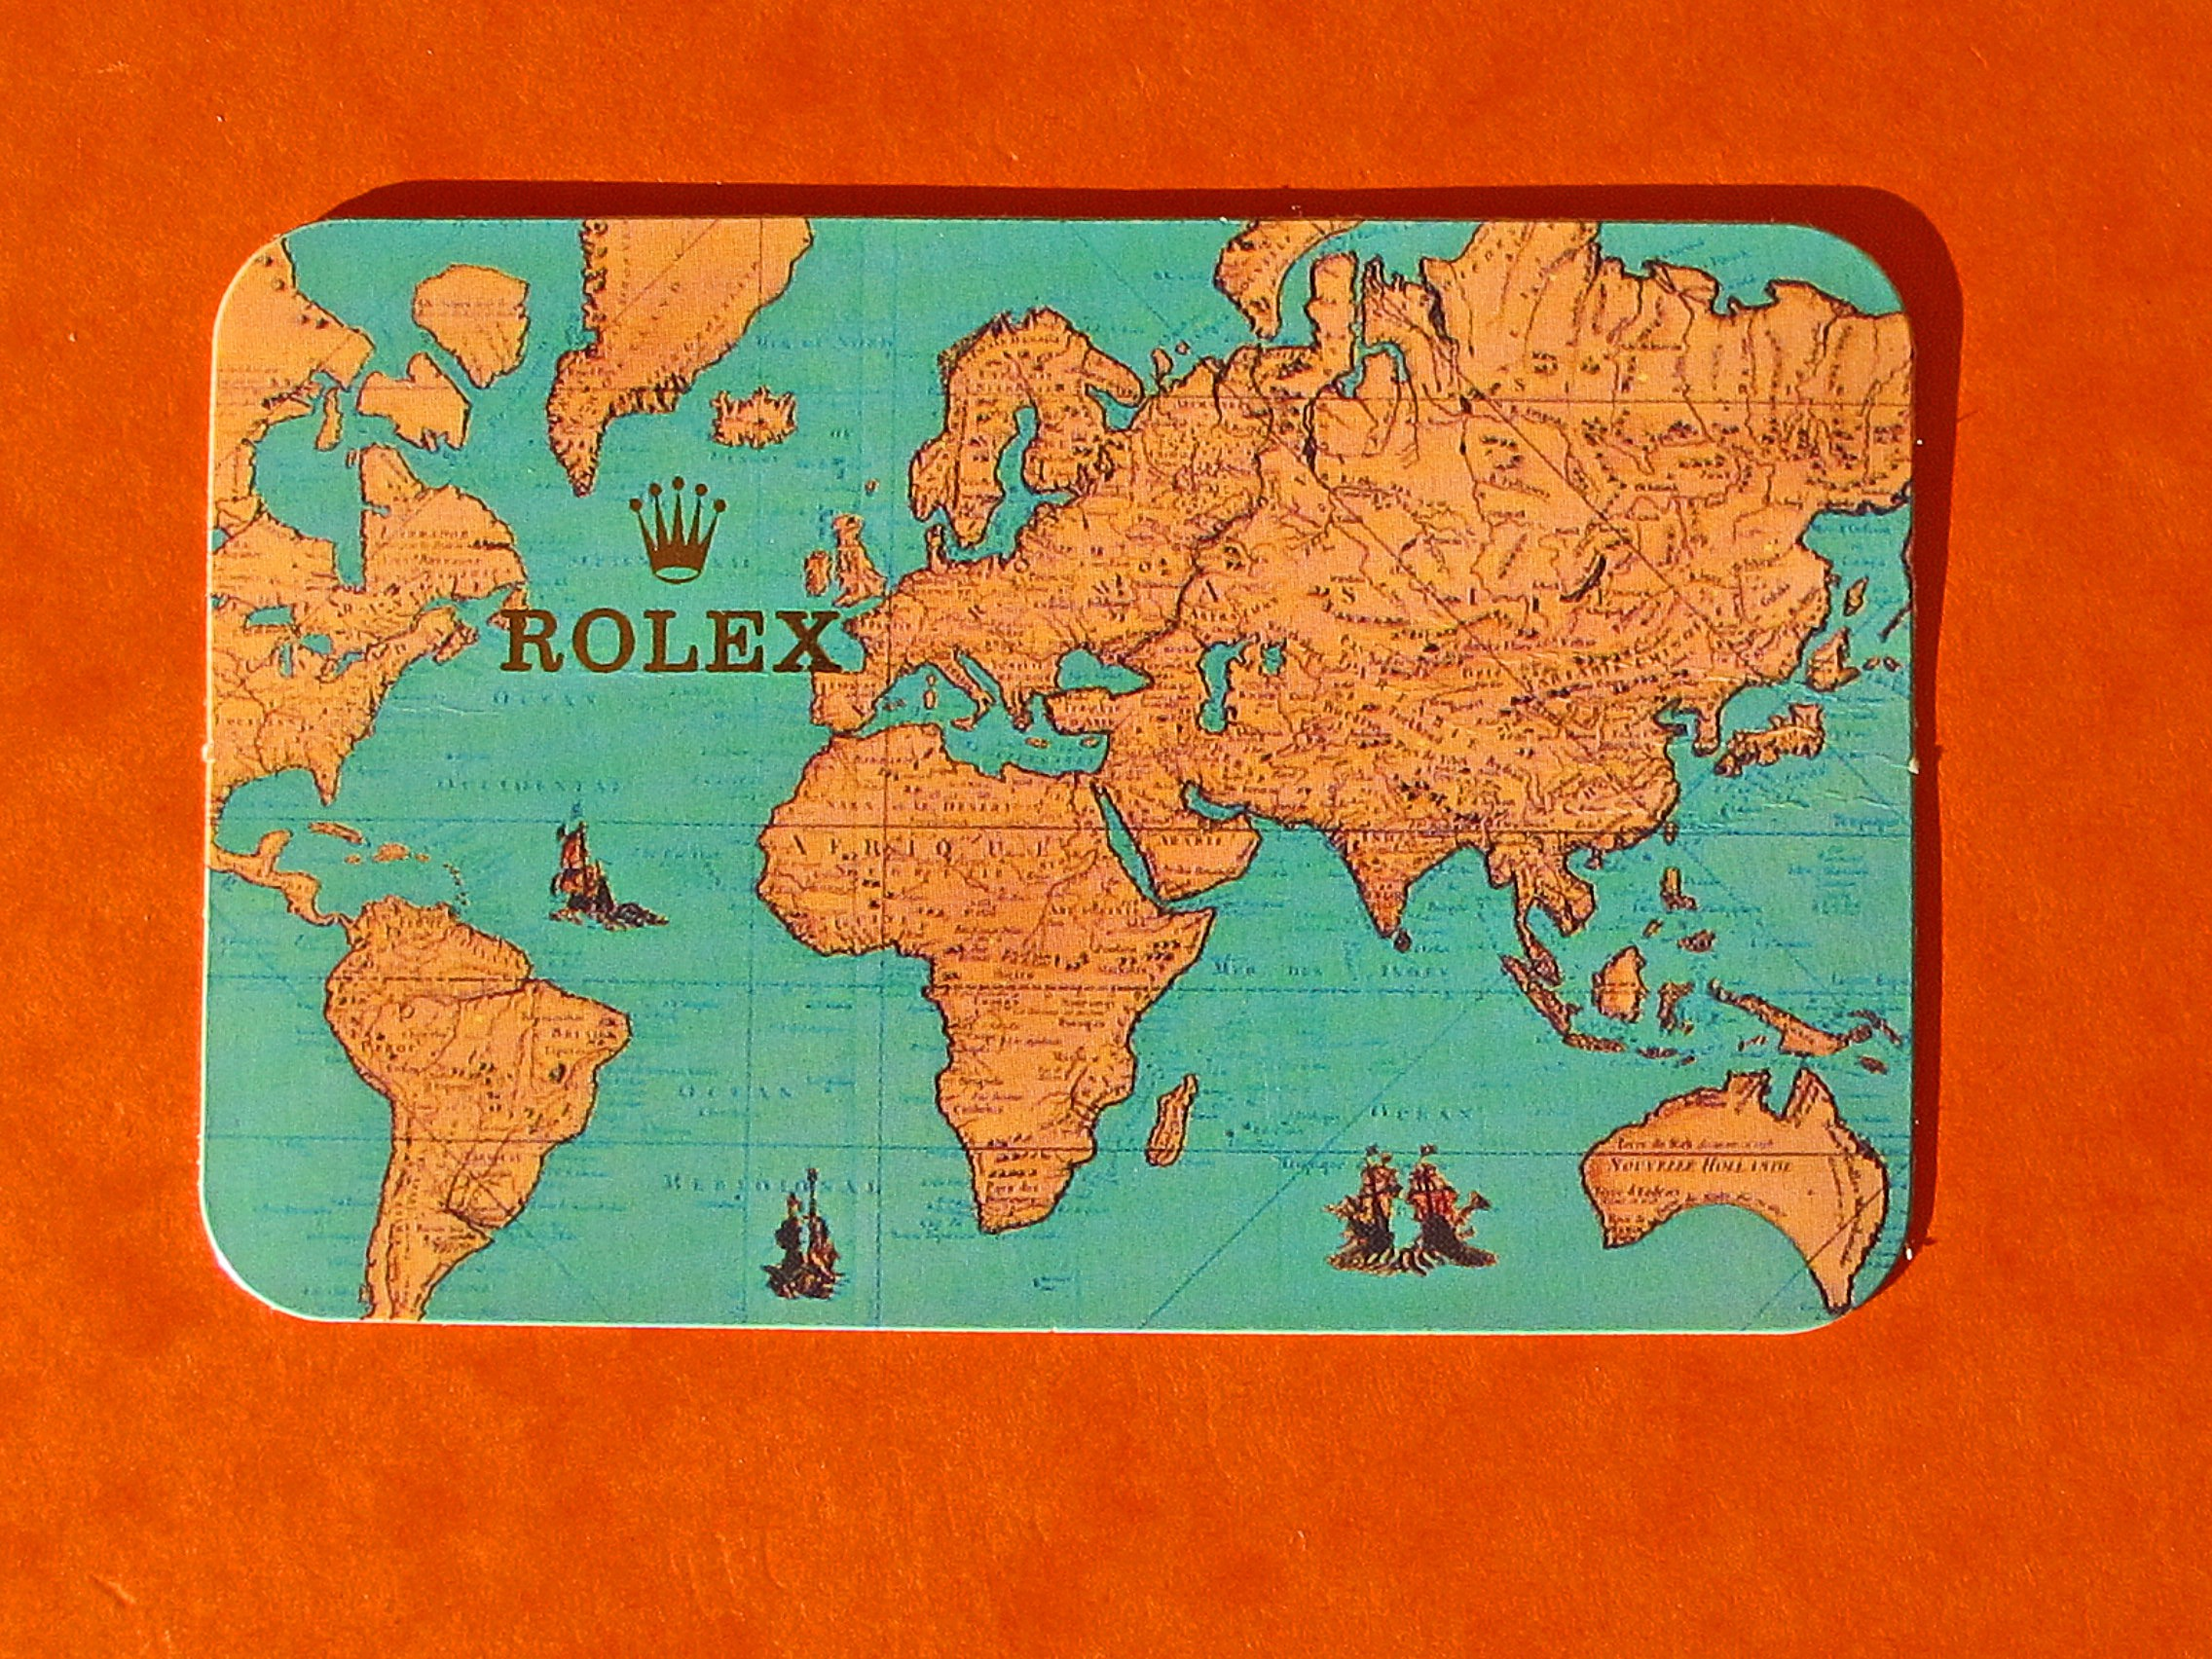 ROLEX CALENDRIER 1999-2000